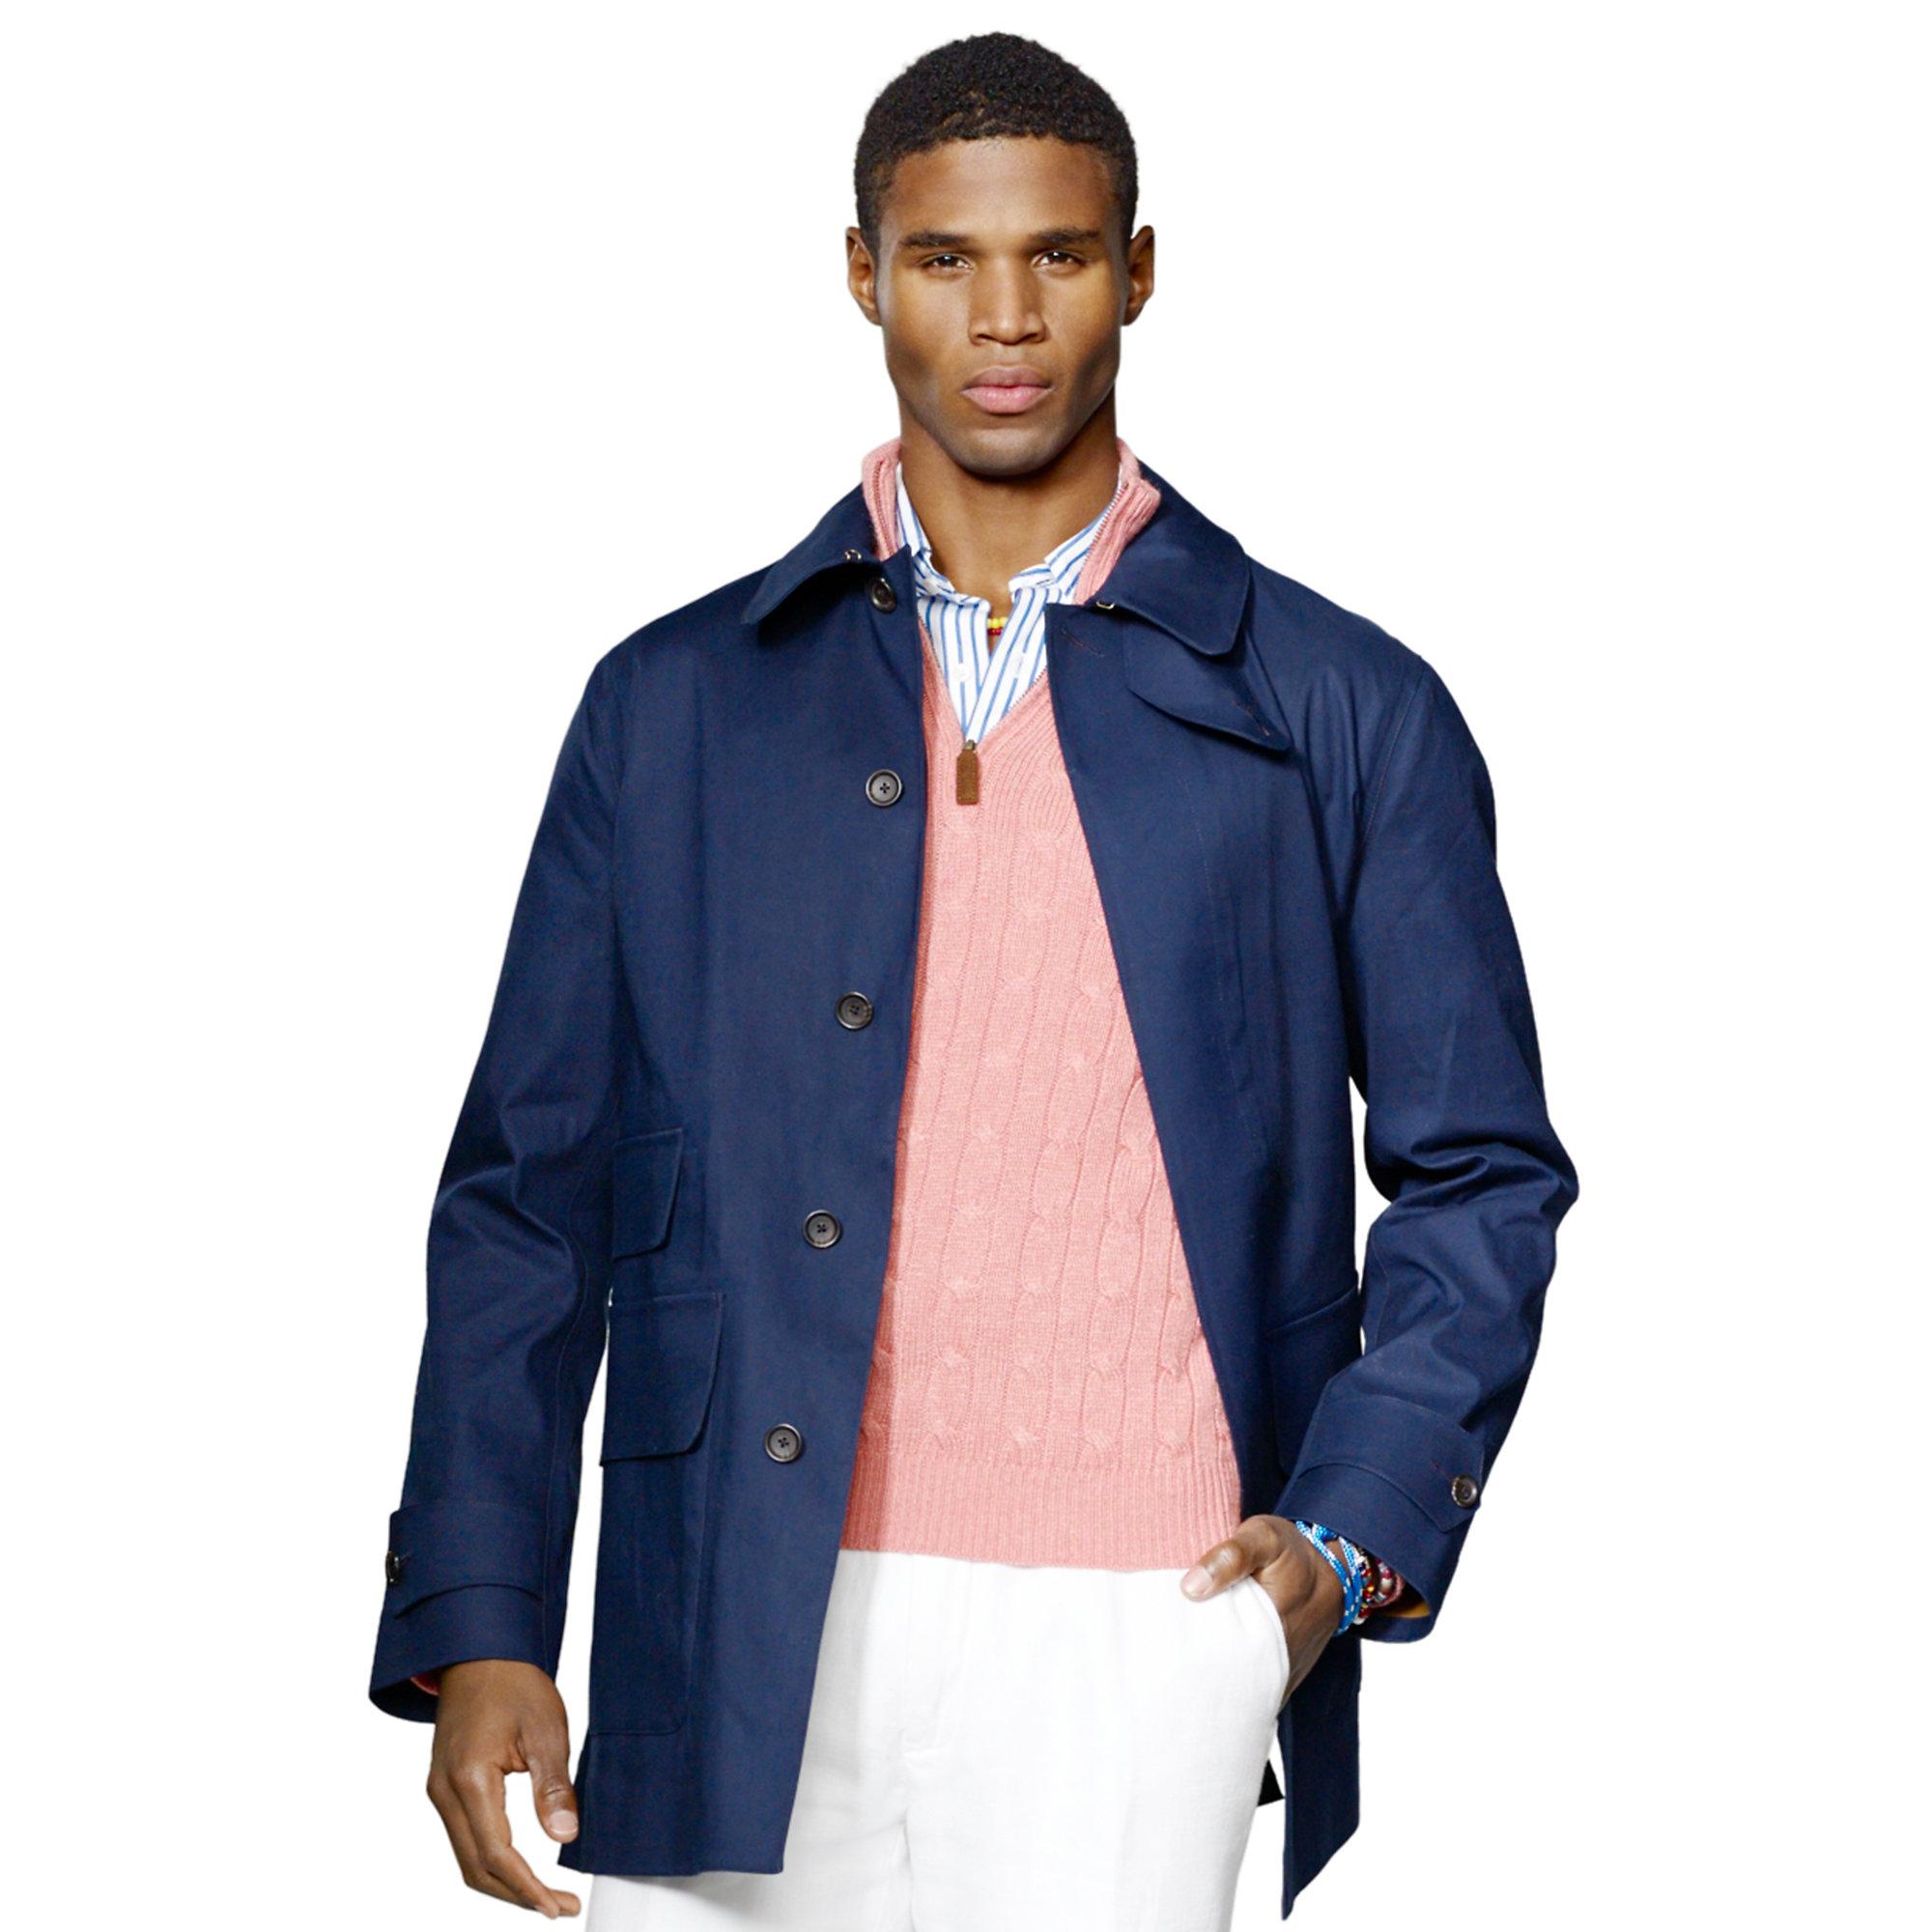 lyst polo ralph lauren brook walking coat in blue for men. Black Bedroom Furniture Sets. Home Design Ideas